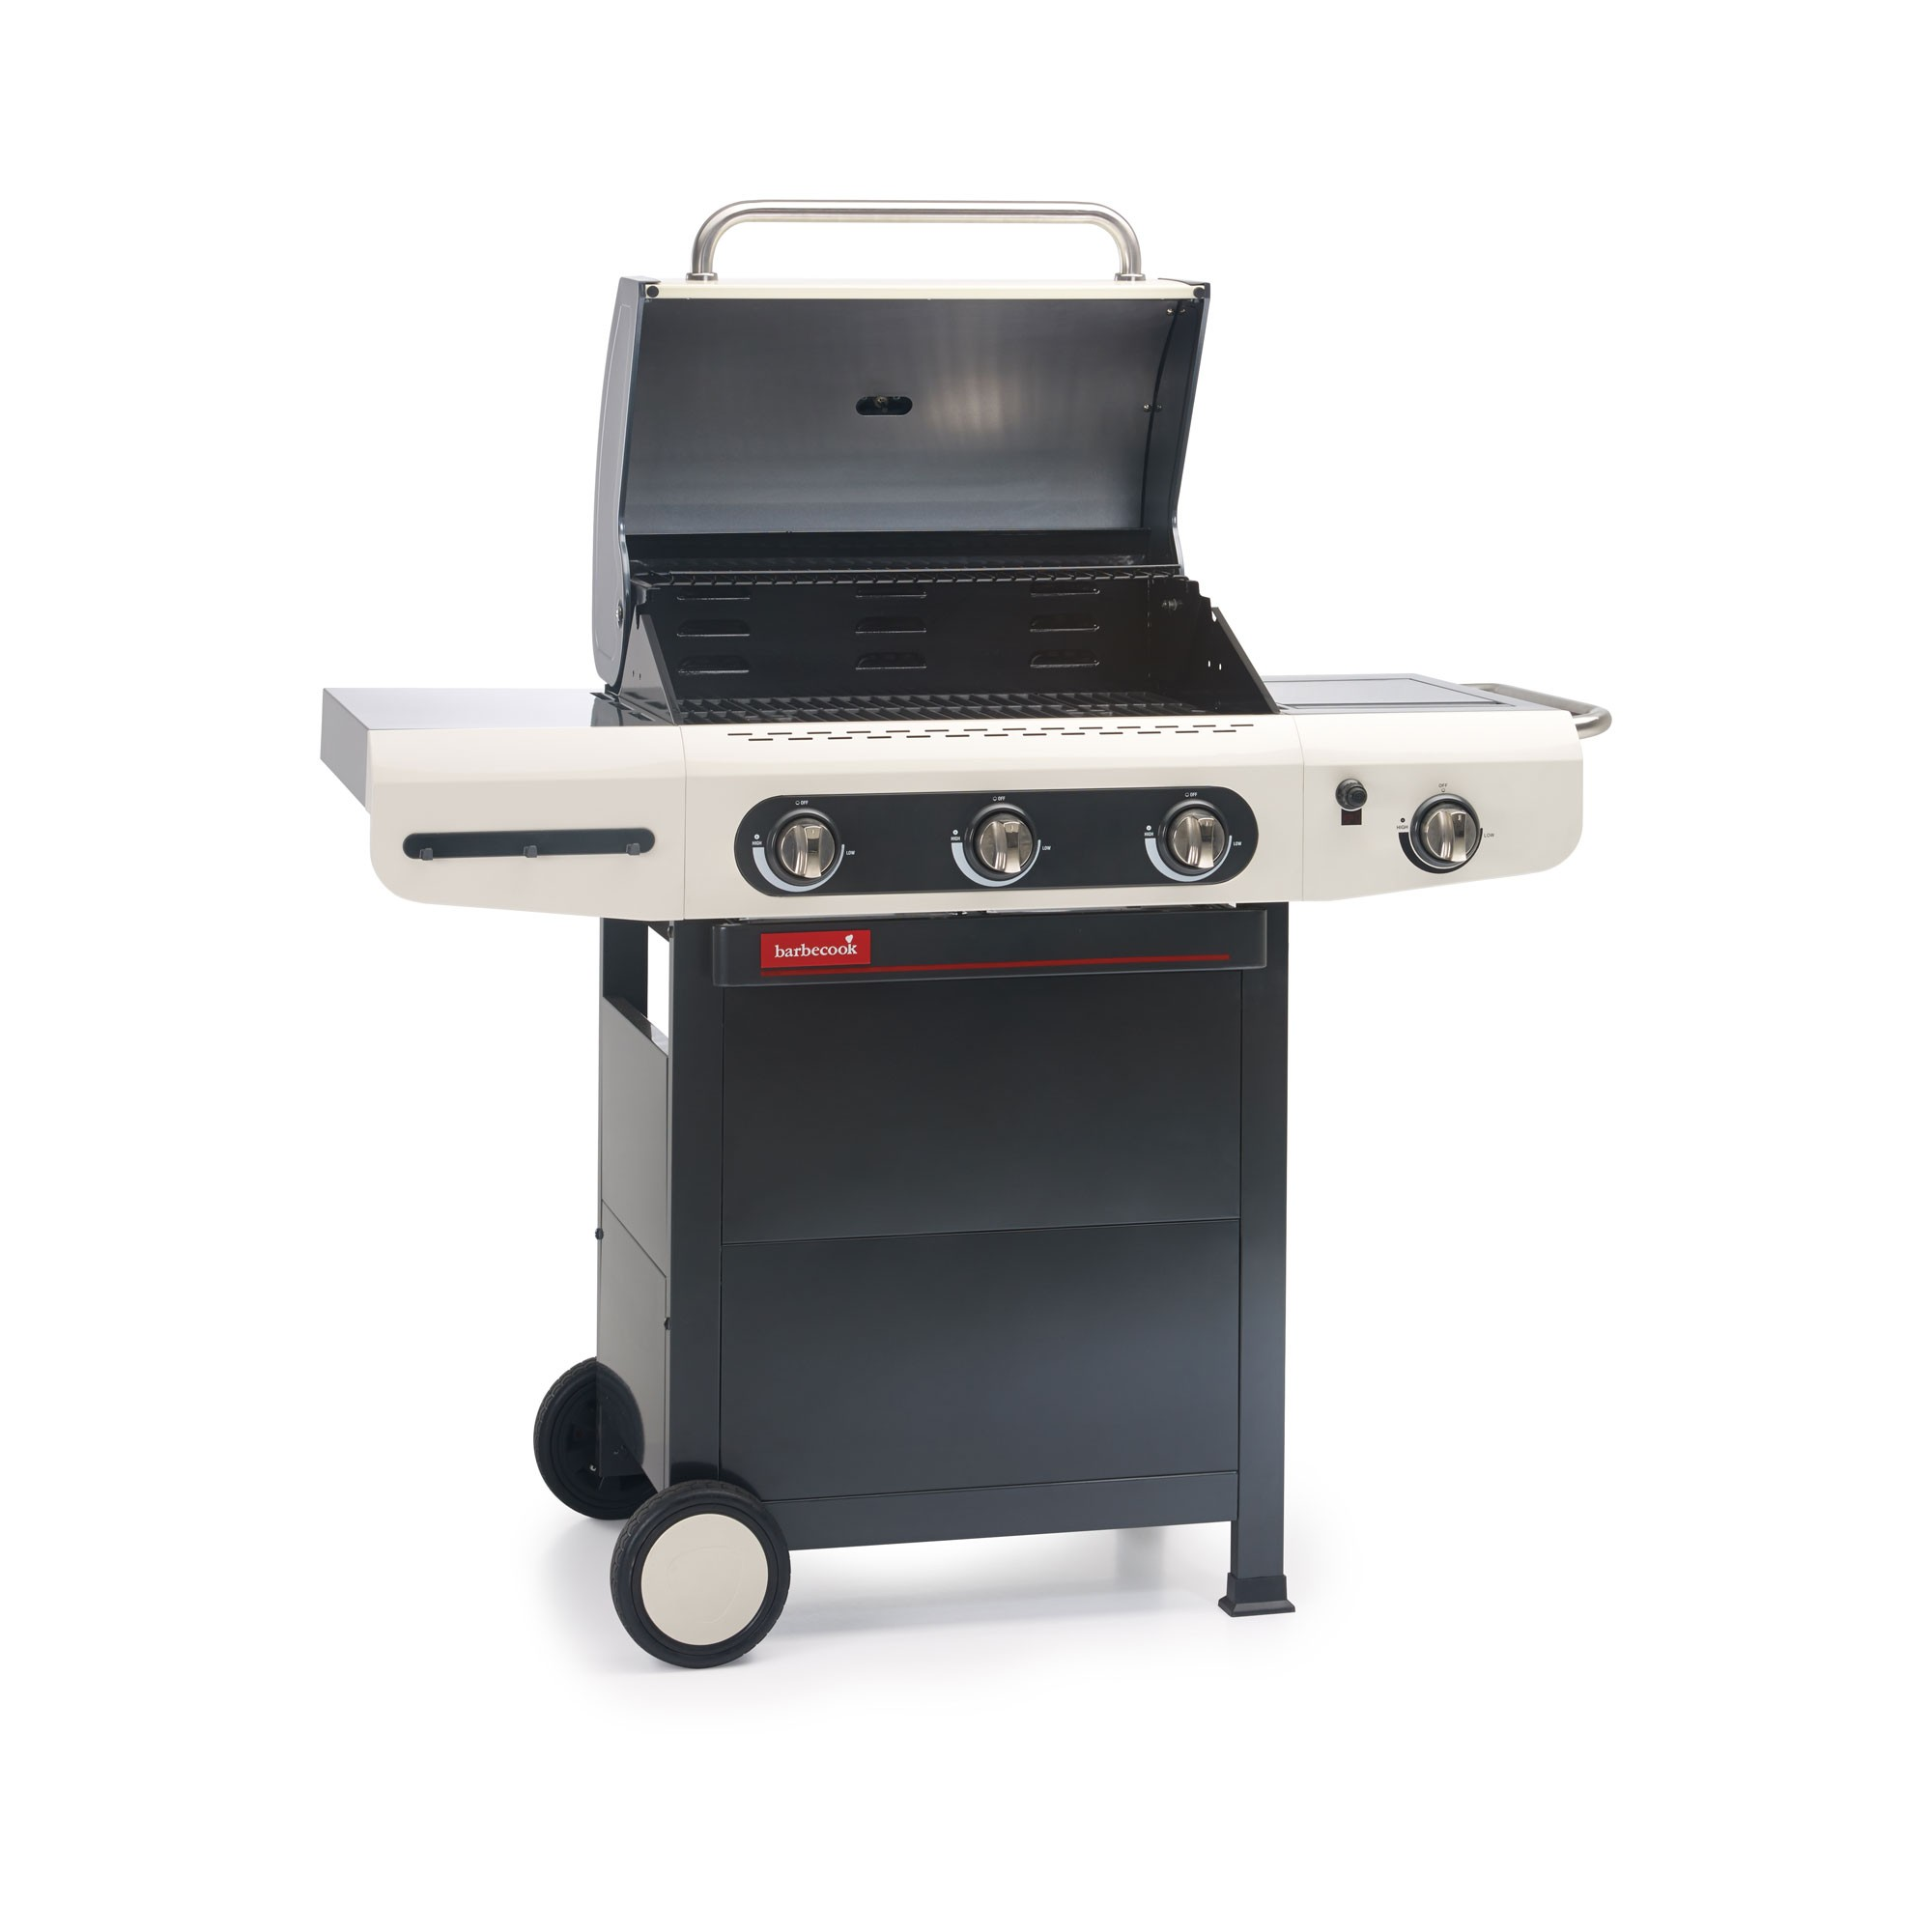 Gasgrill / Gasgrillwagen barbecook Siesta 310 creme m. Plancha 62x43cm Bild 2